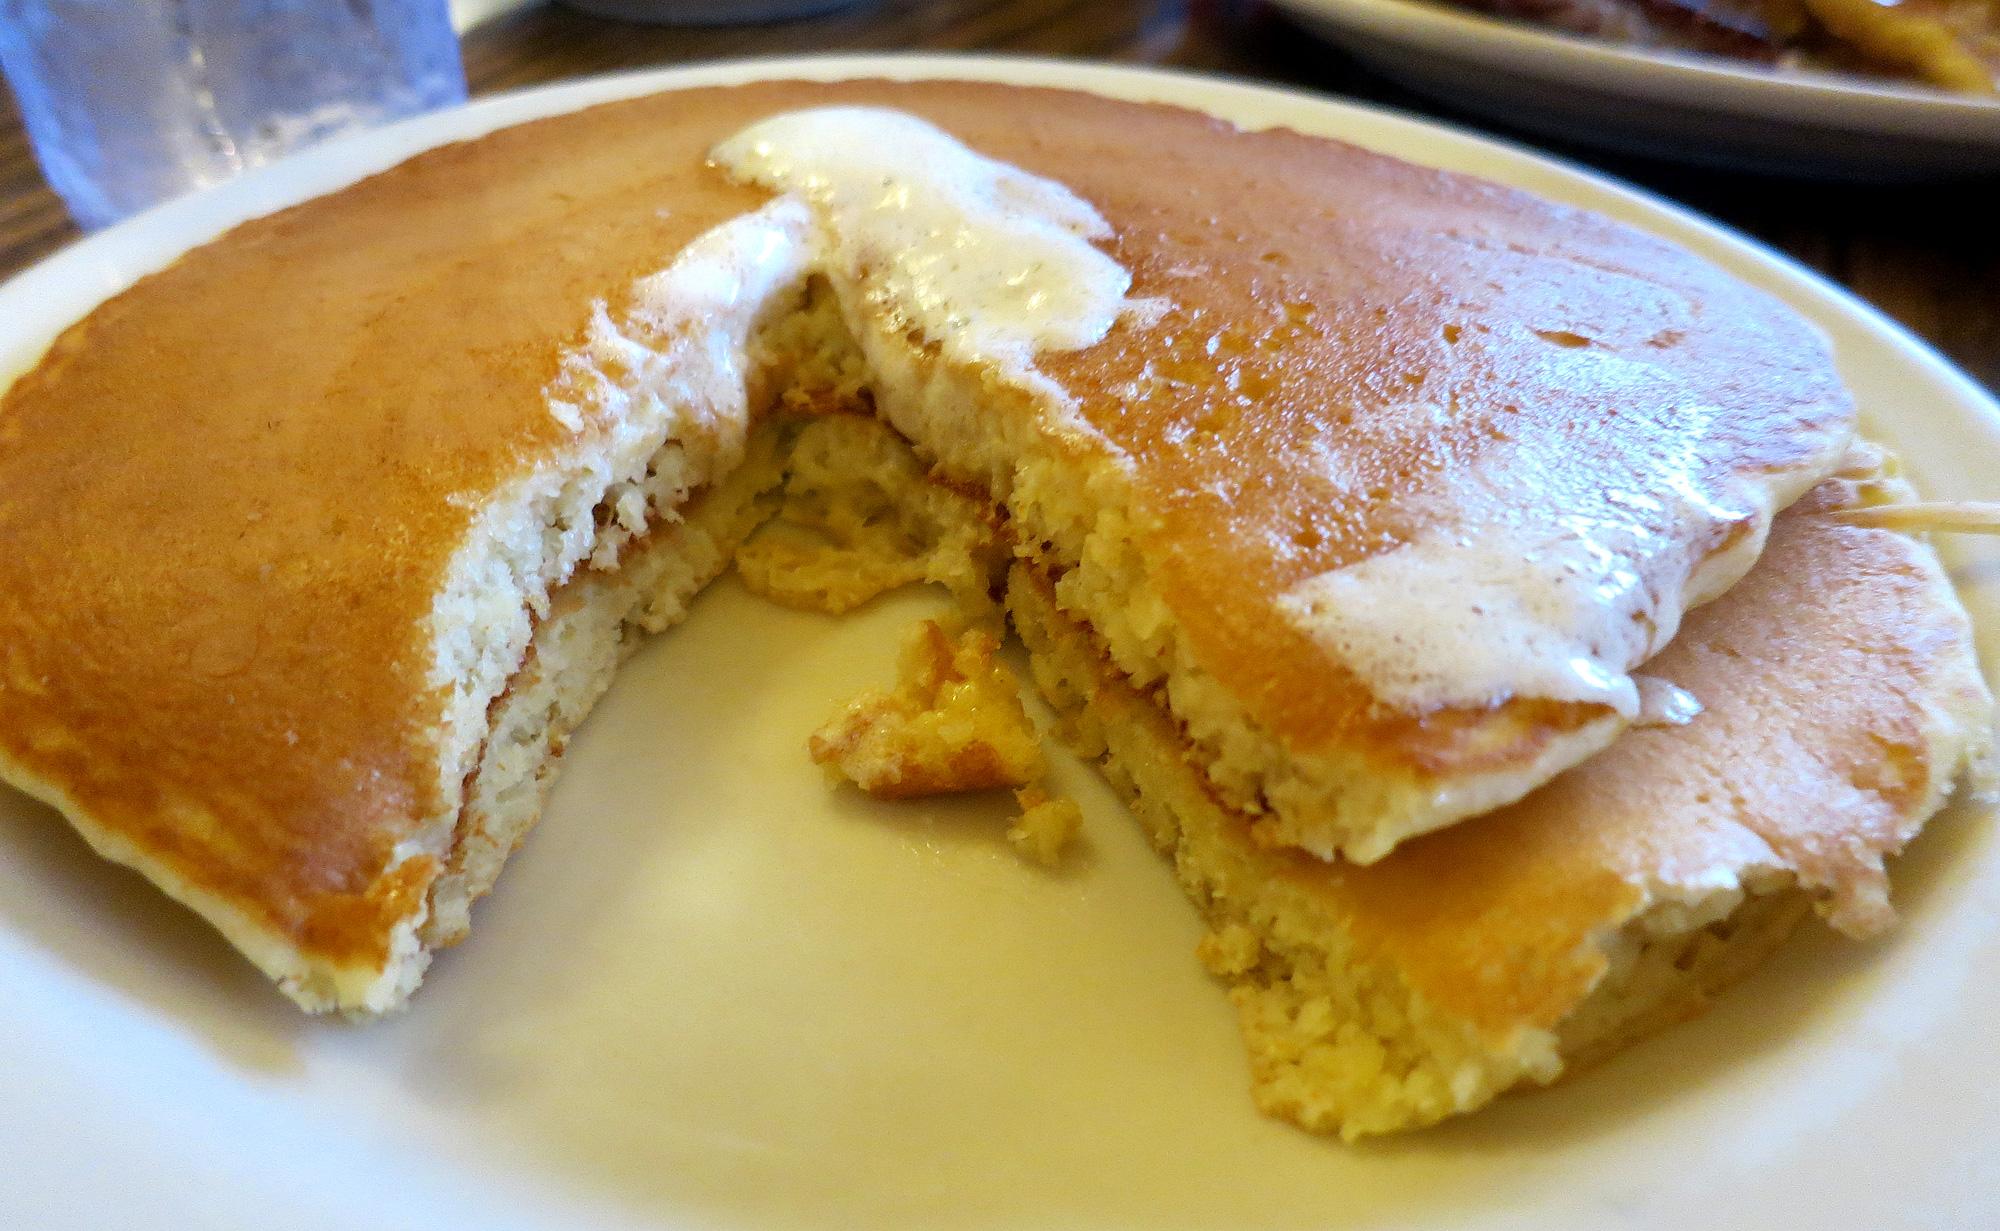 Kalihi Eats The Original Pancake House Tasty Island